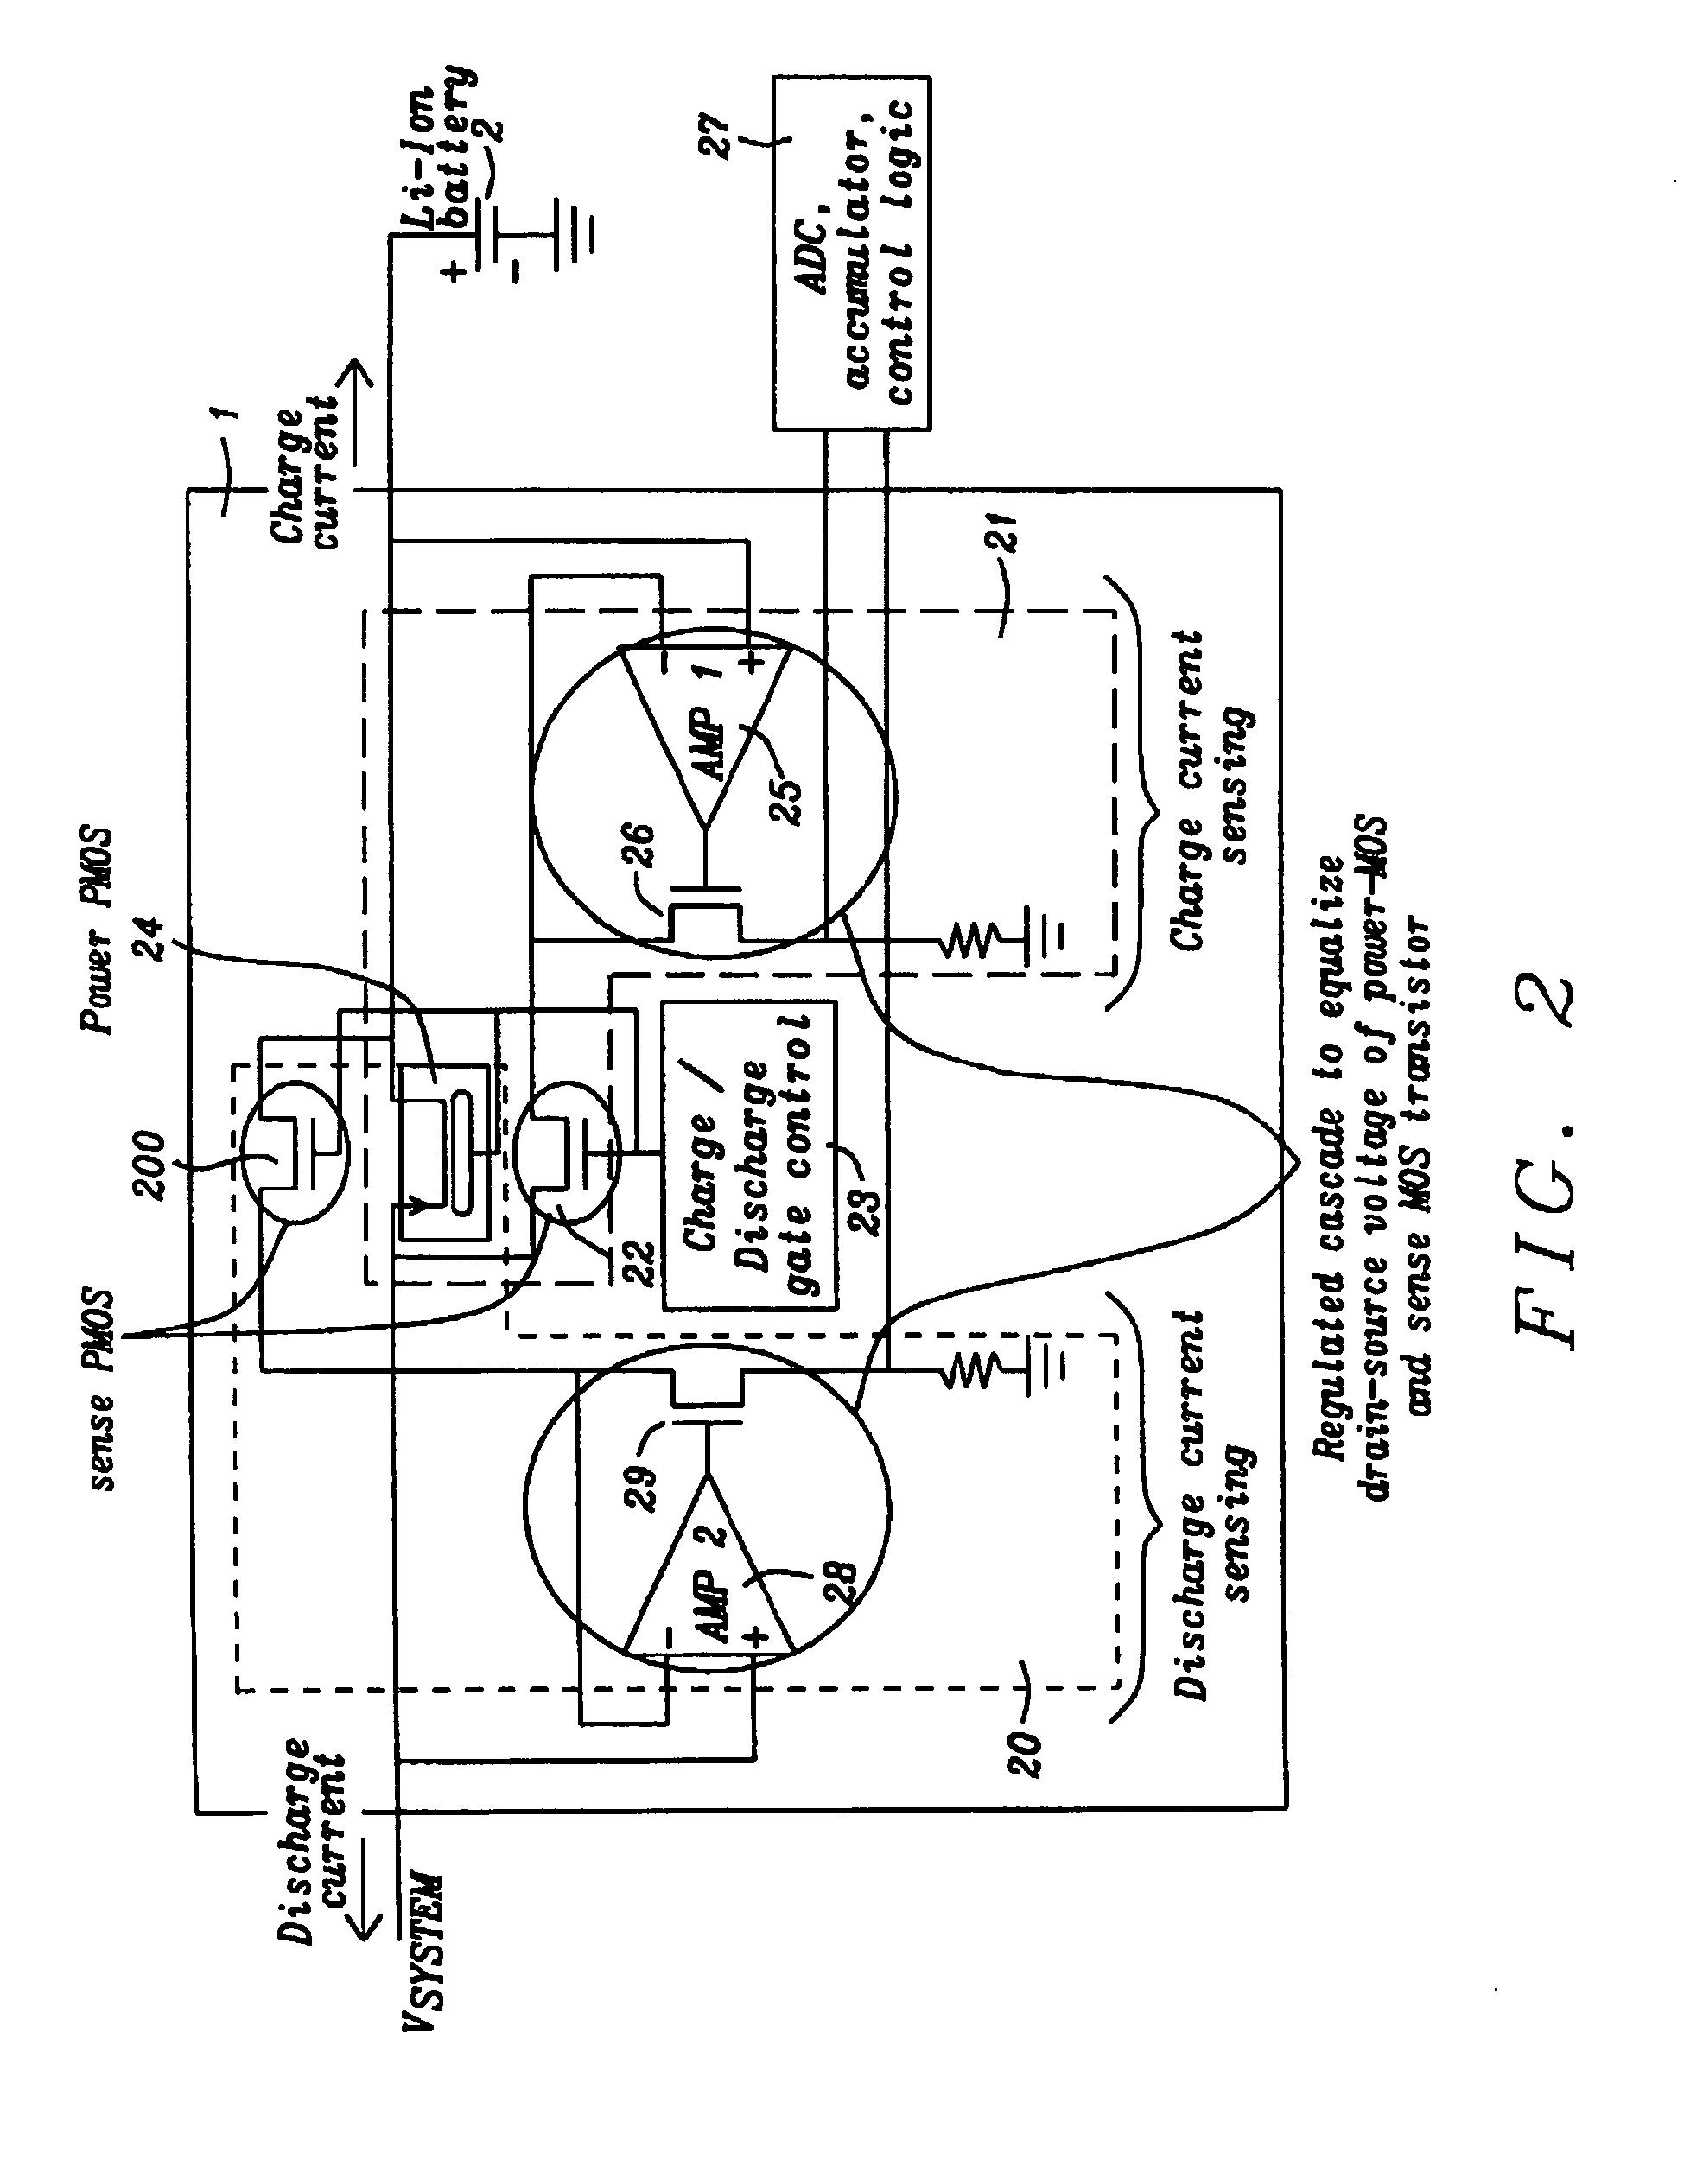 patent ep2515126a1 - bidirectional current sense